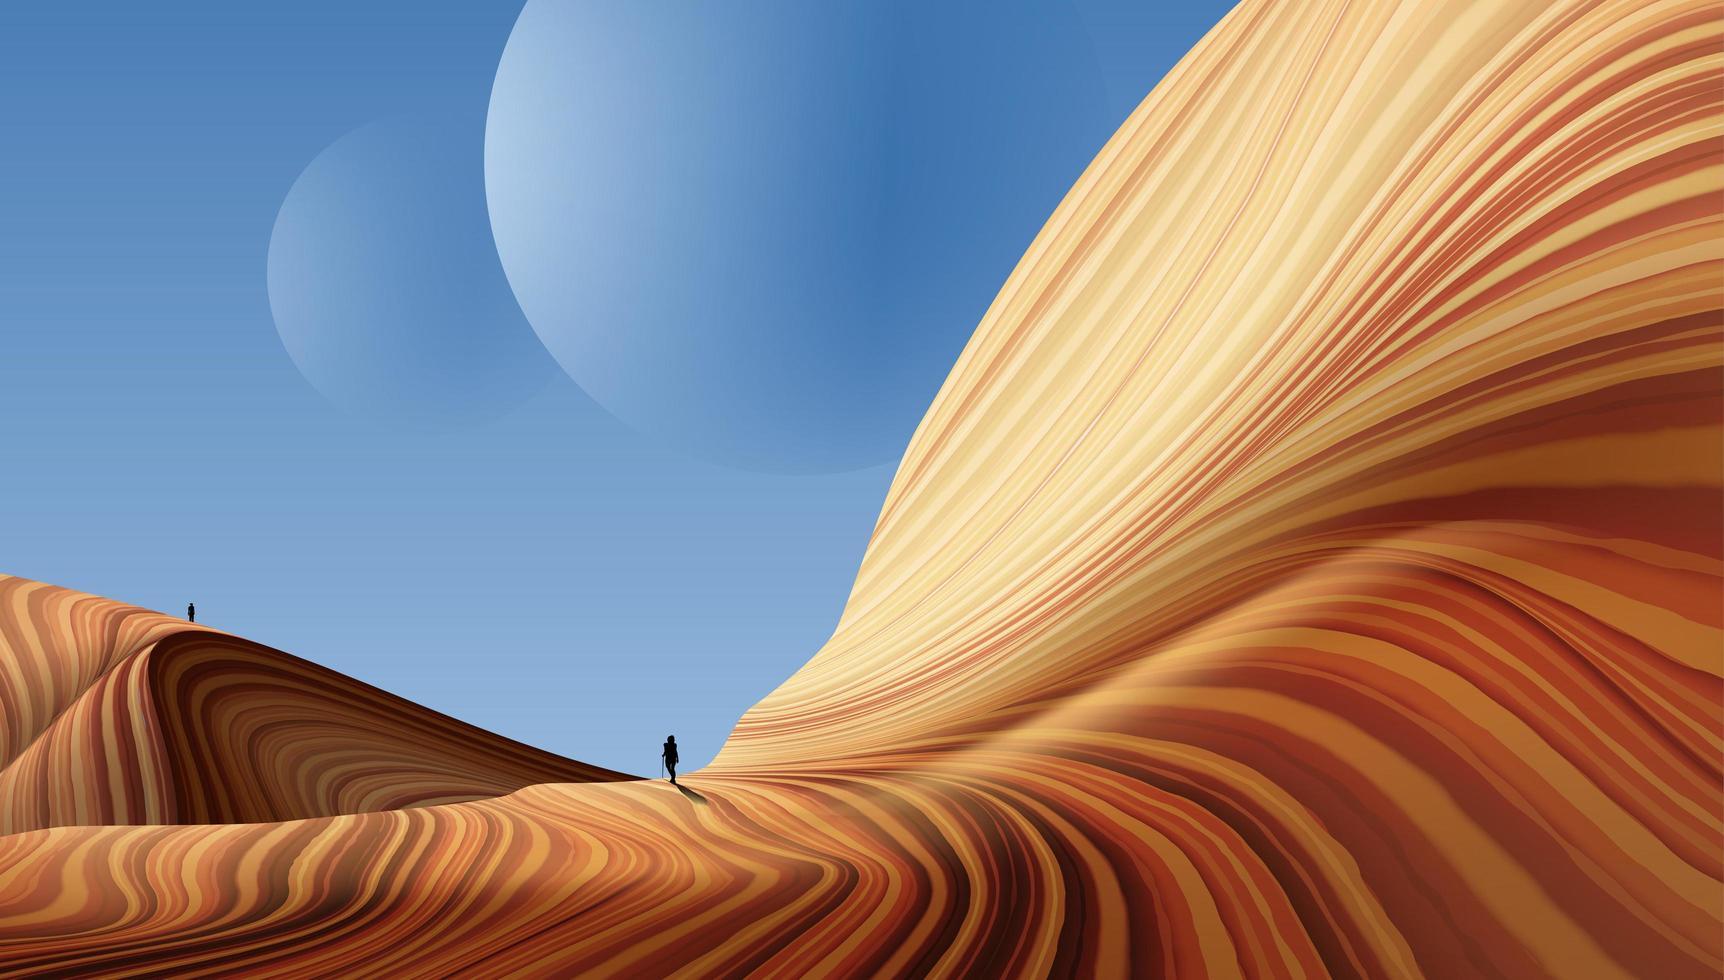 Antelope Canyon Landscape vector